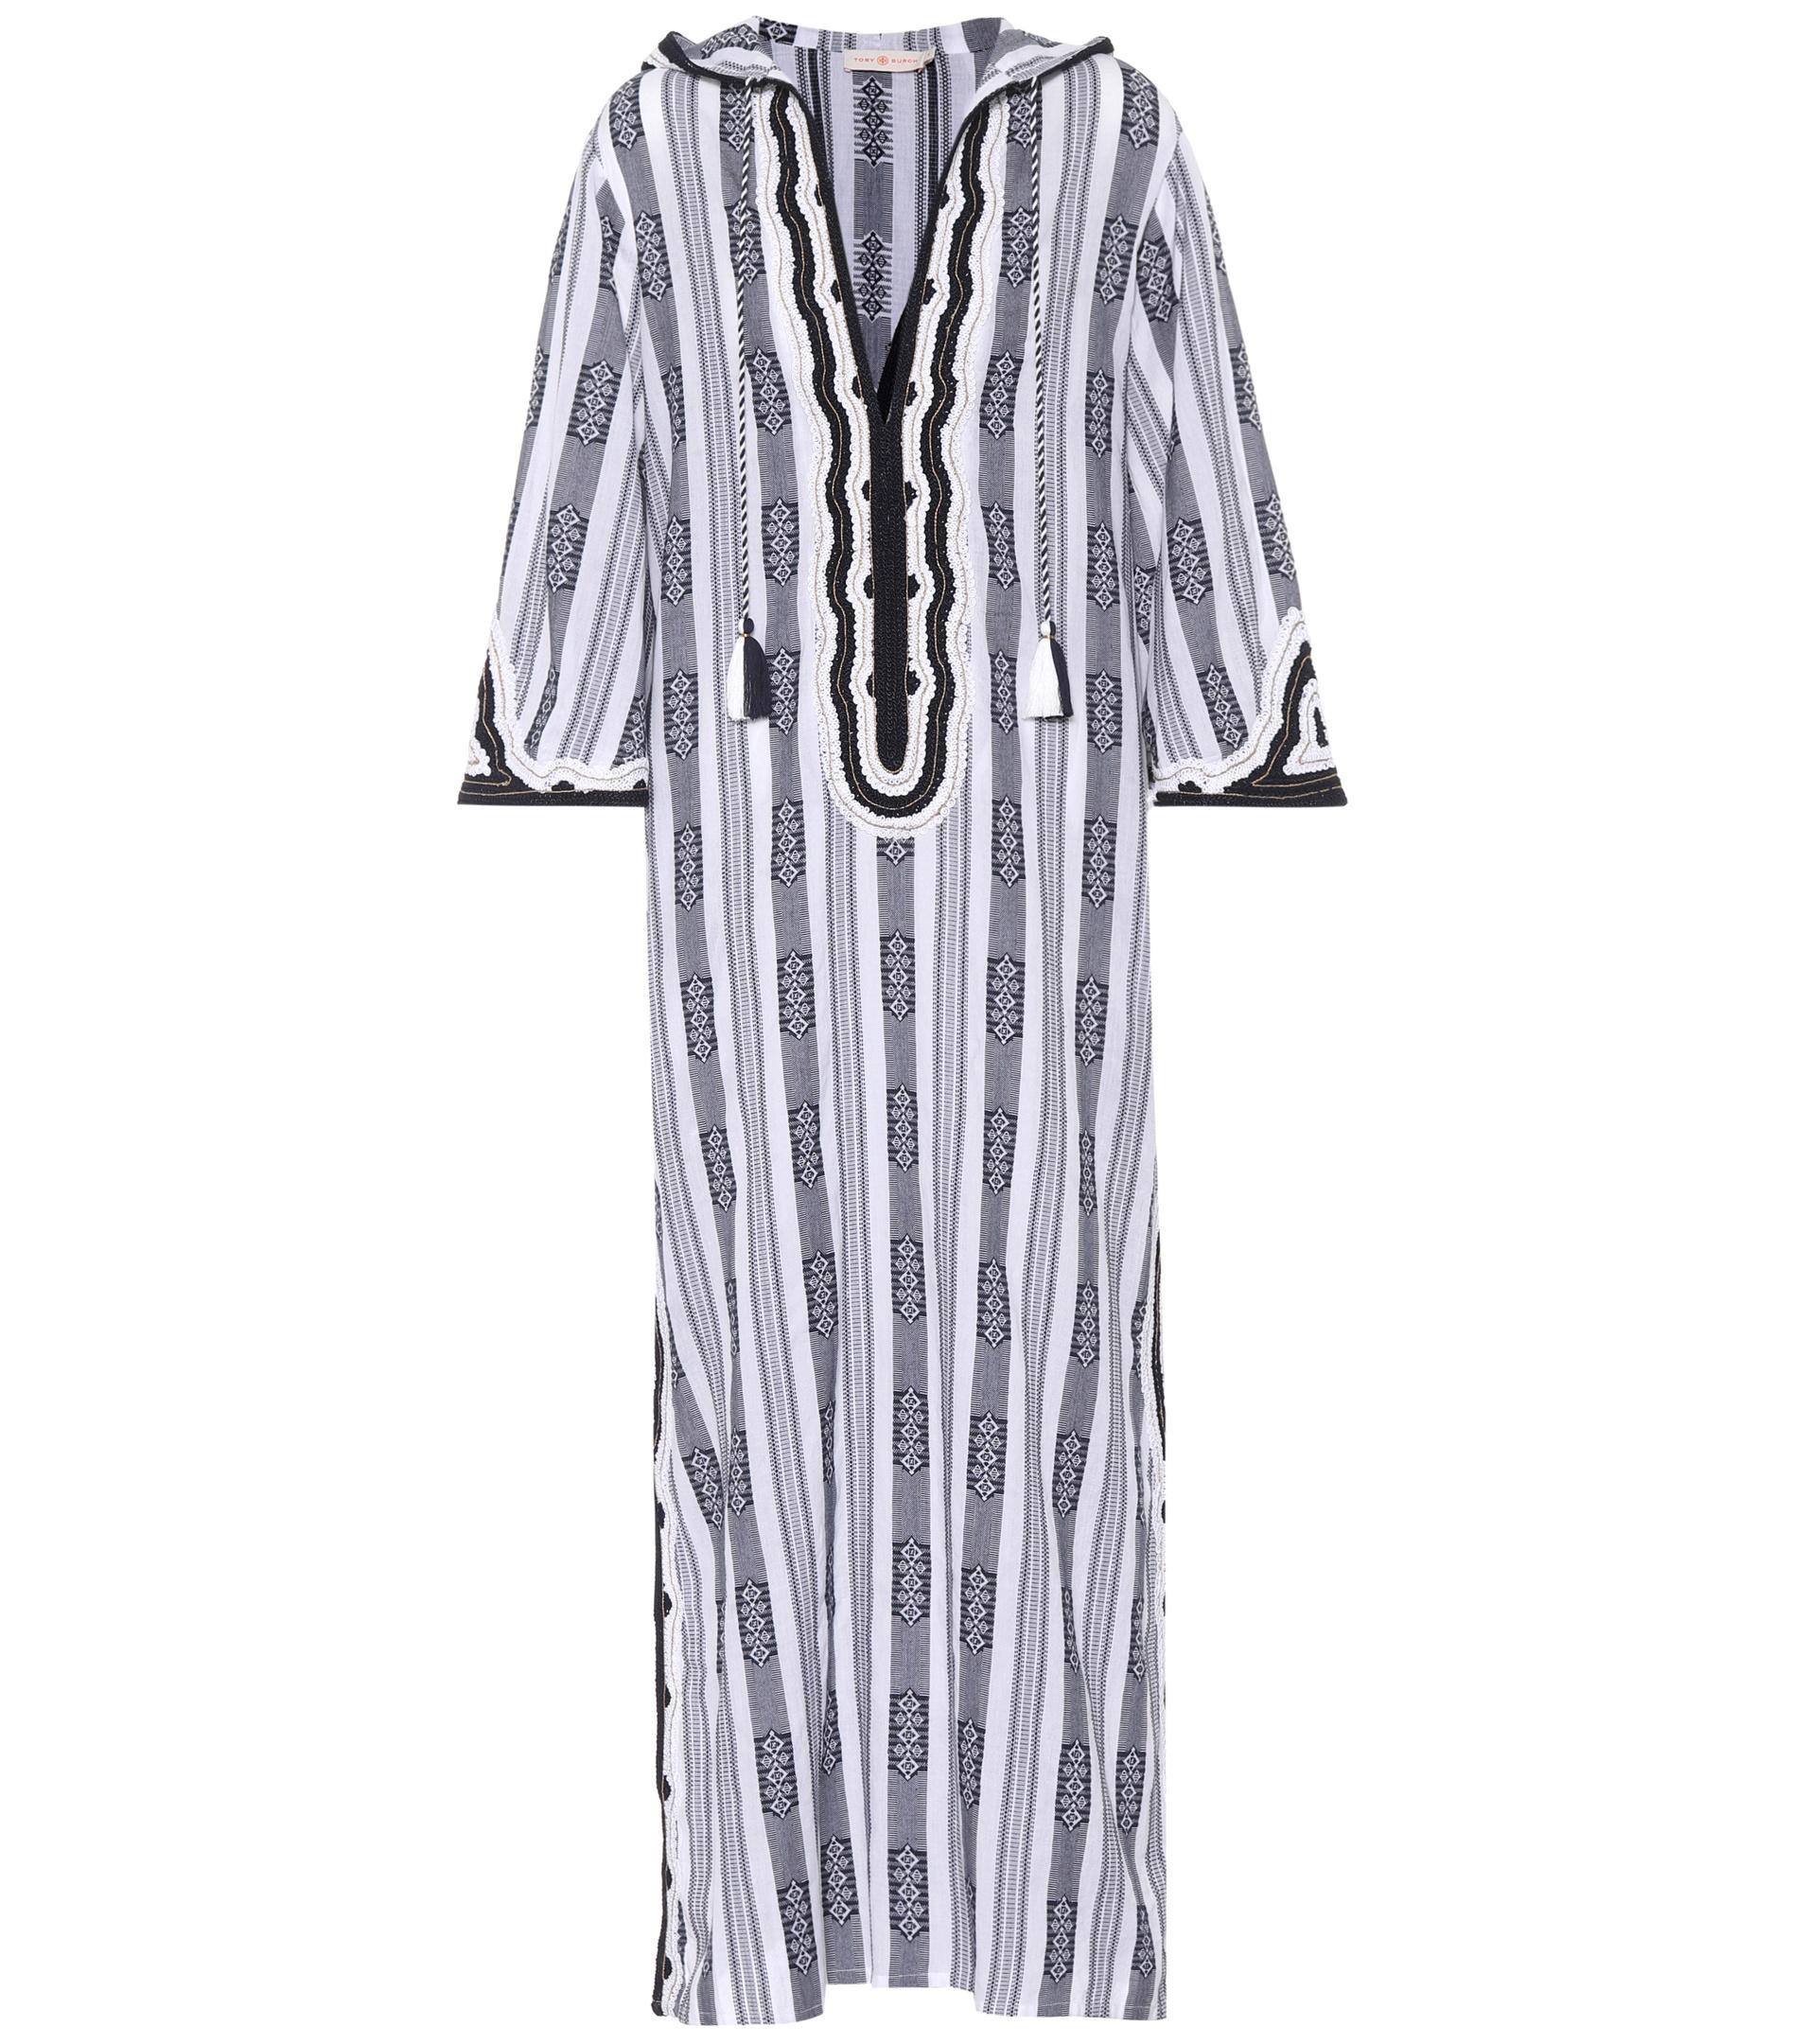 Corbin printed cotton caftan dress Tory Burch Huge Surprise Online For Sale Footlocker vTgt6Y